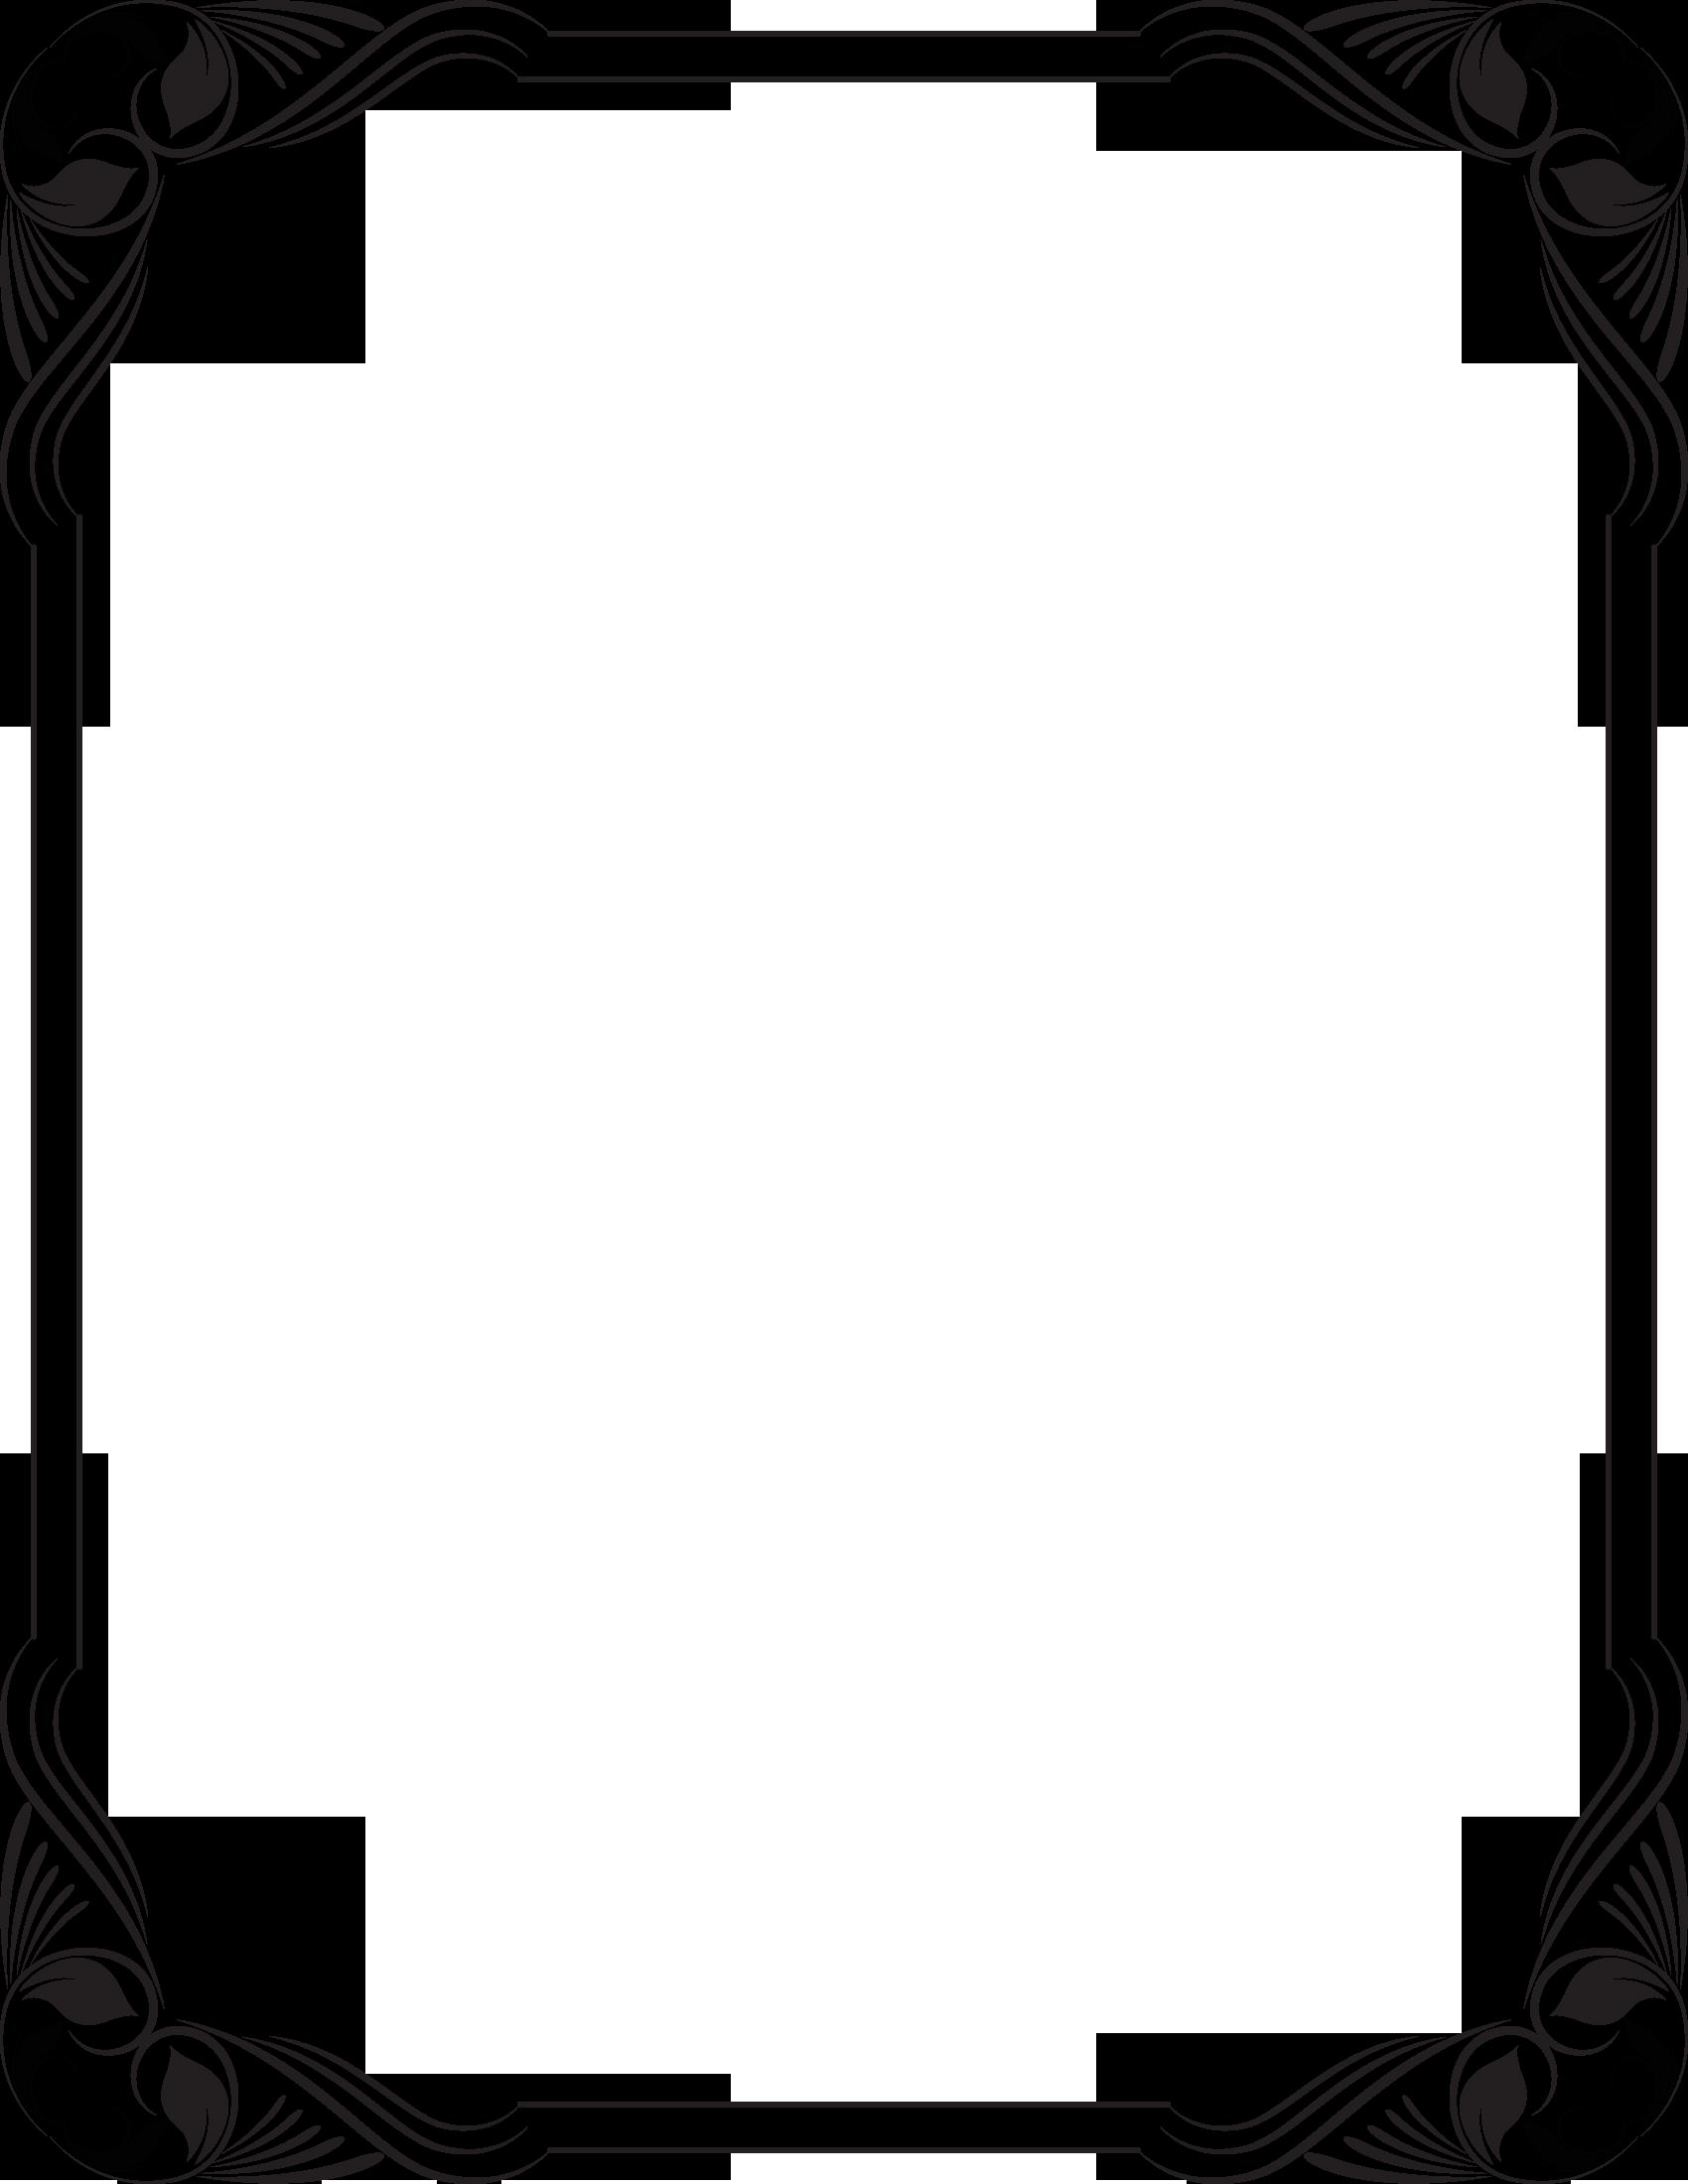 Envelope Clipart Gambar Envelope Gambar Transparent FREE